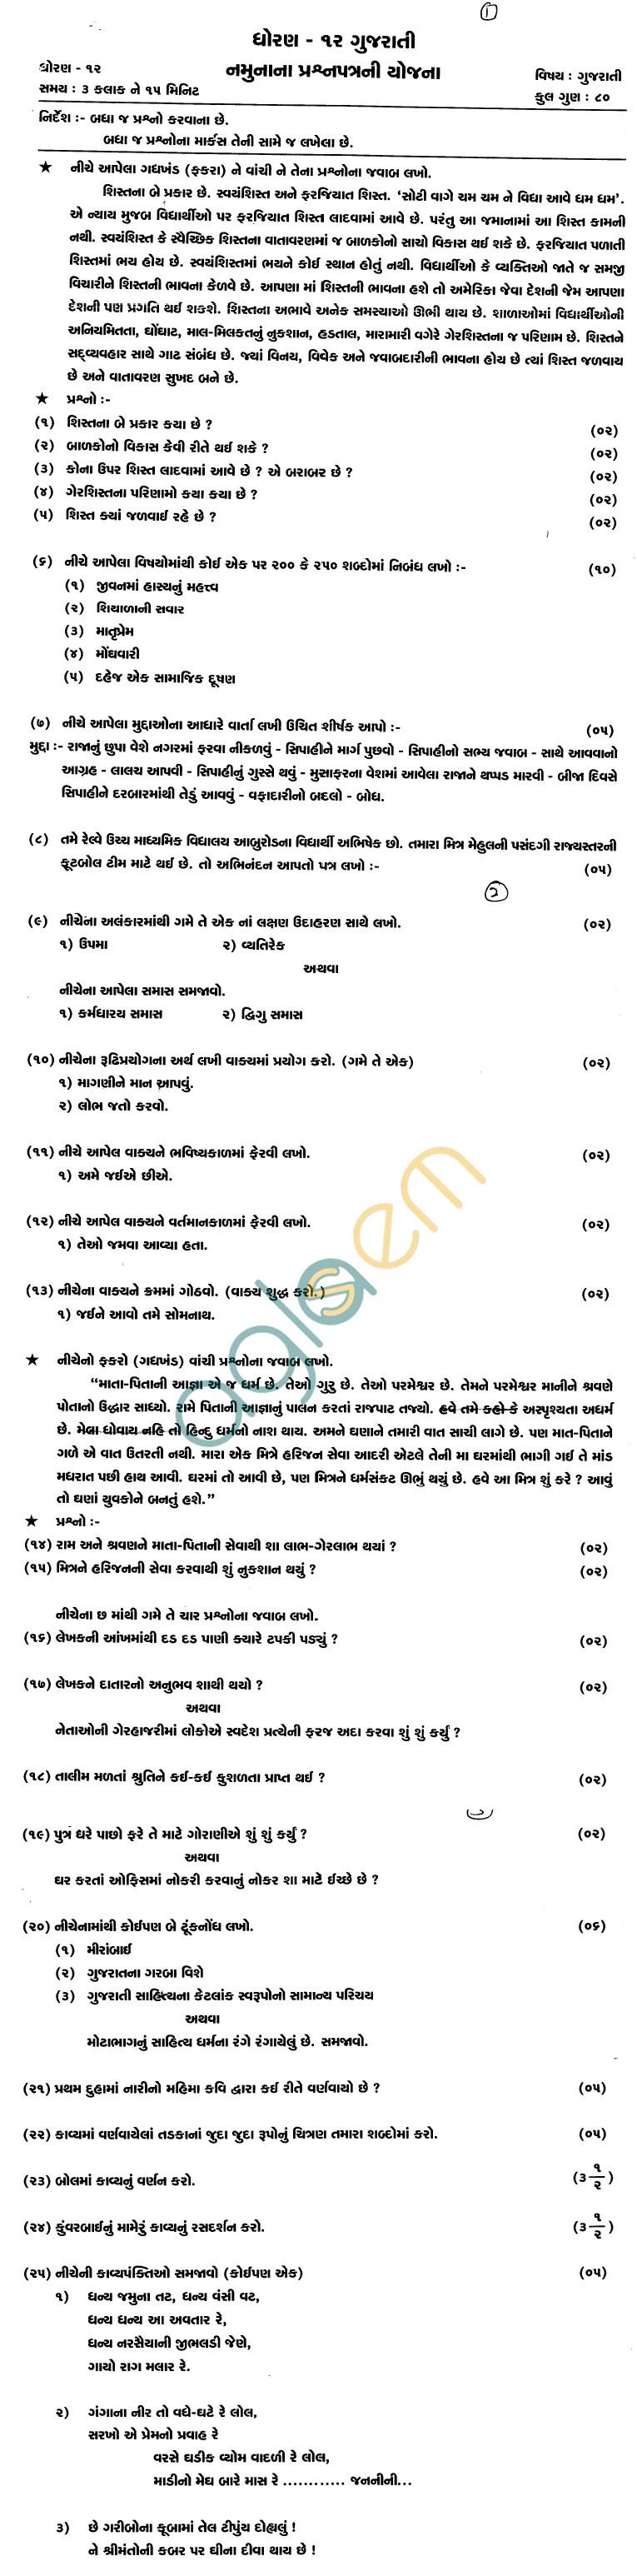 Rajasthan Board Class 12 Gujrati Paper Scheme and Blue Print